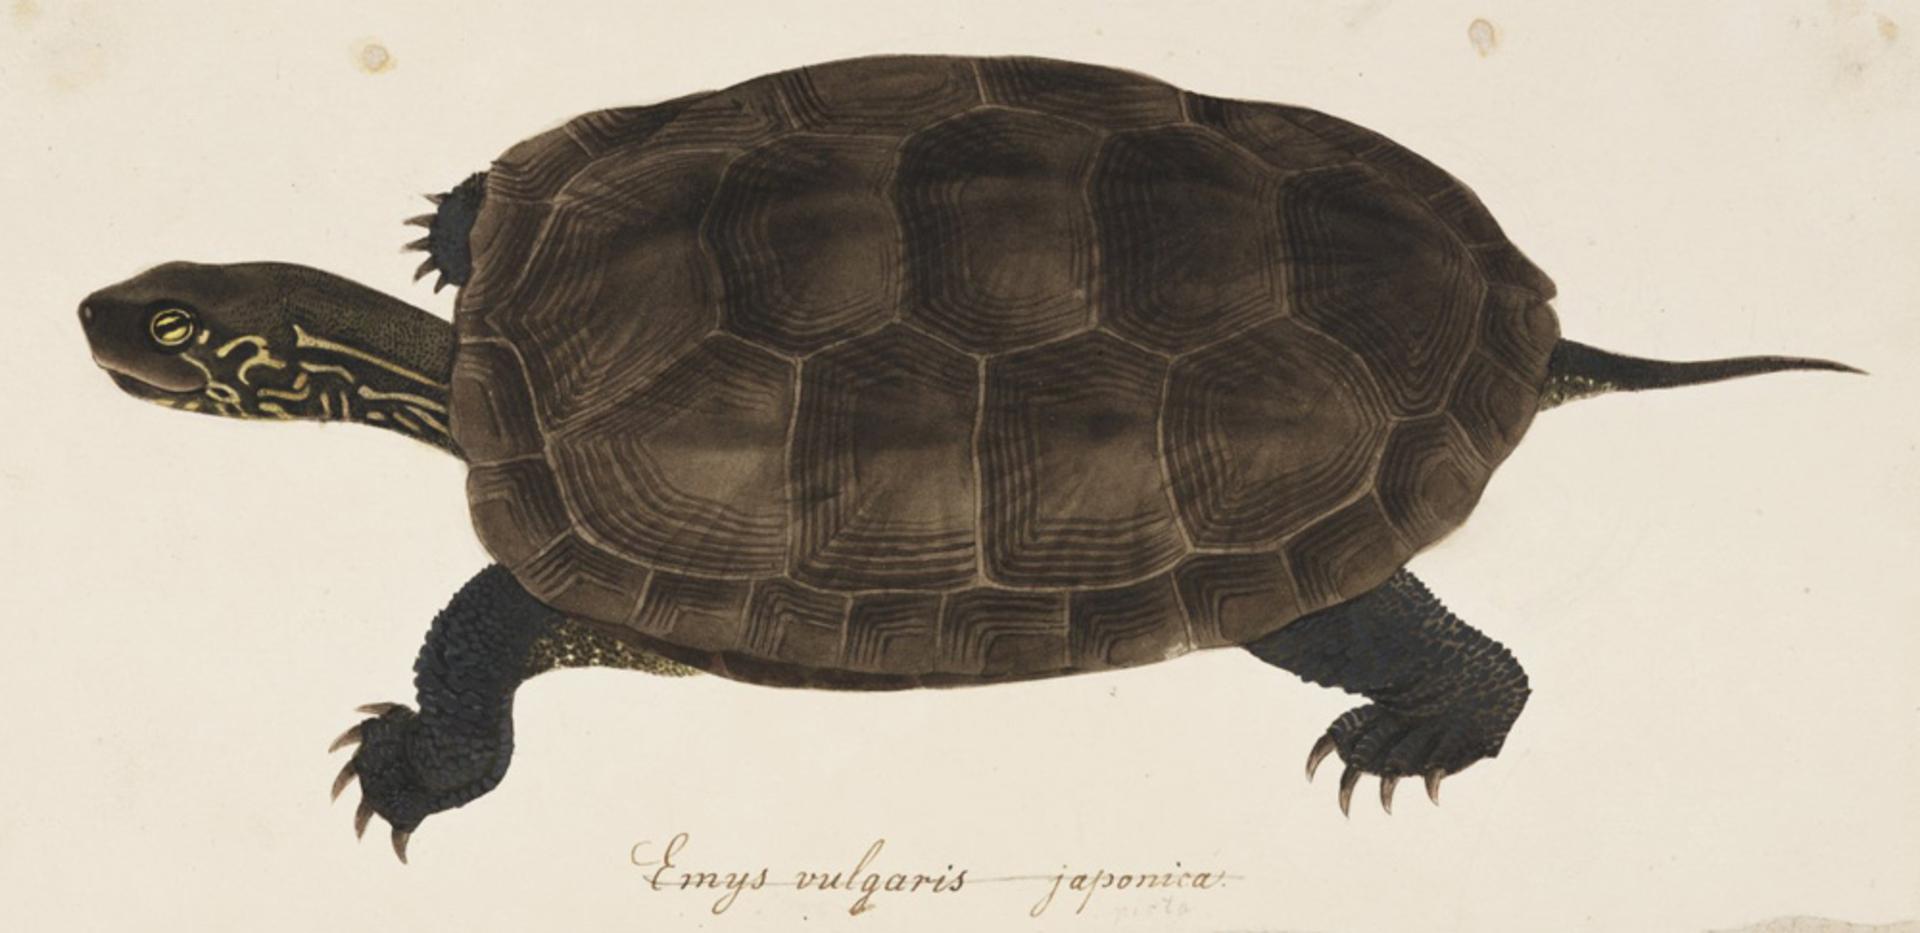 RMNH.ART.274   Chinemys reevesii